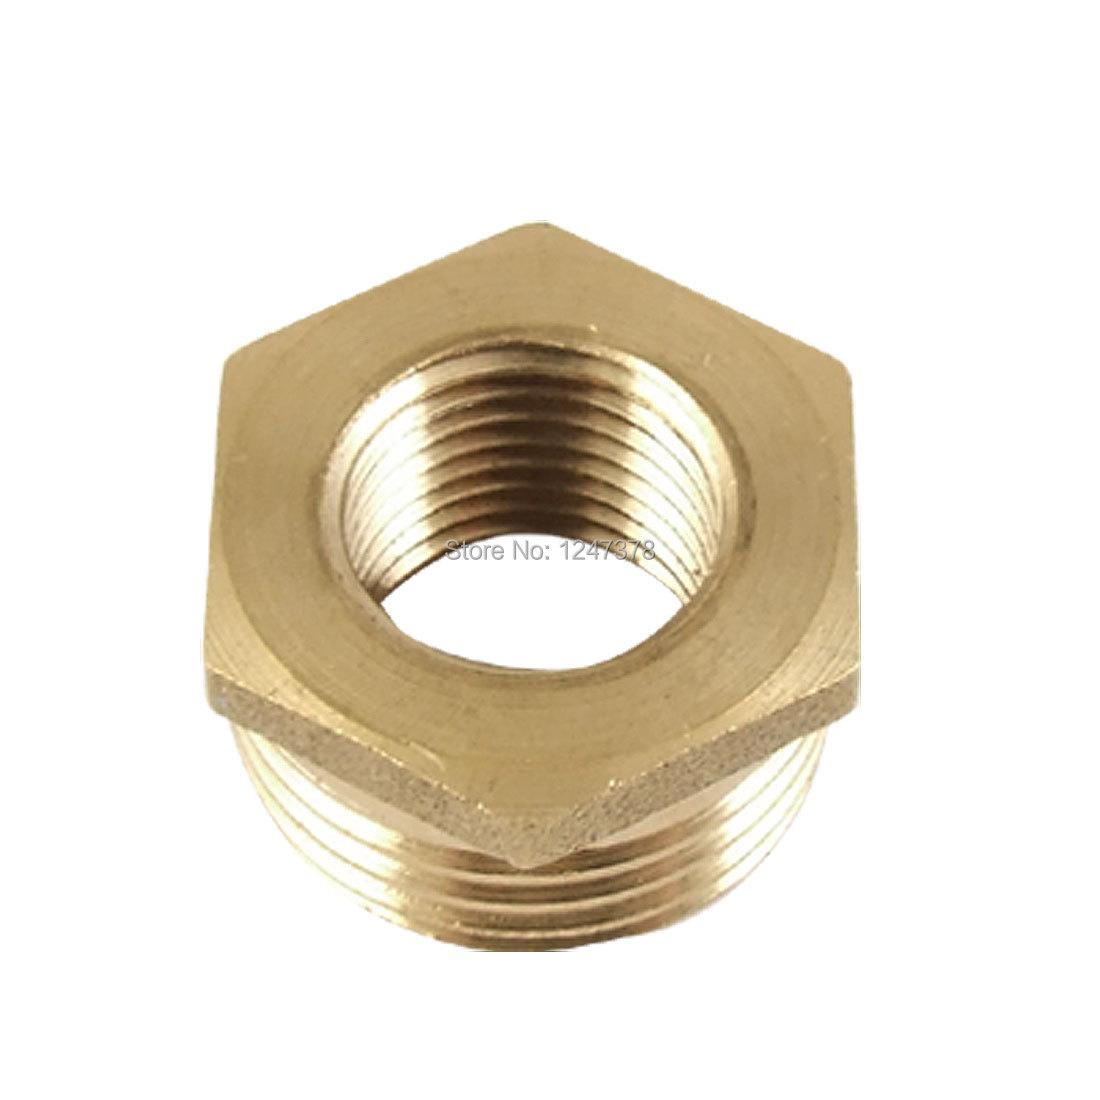 11.9 x 20.5mm Hex Brass Reducing Bushing Pipe Fitting Discount 50(China (Mainland))